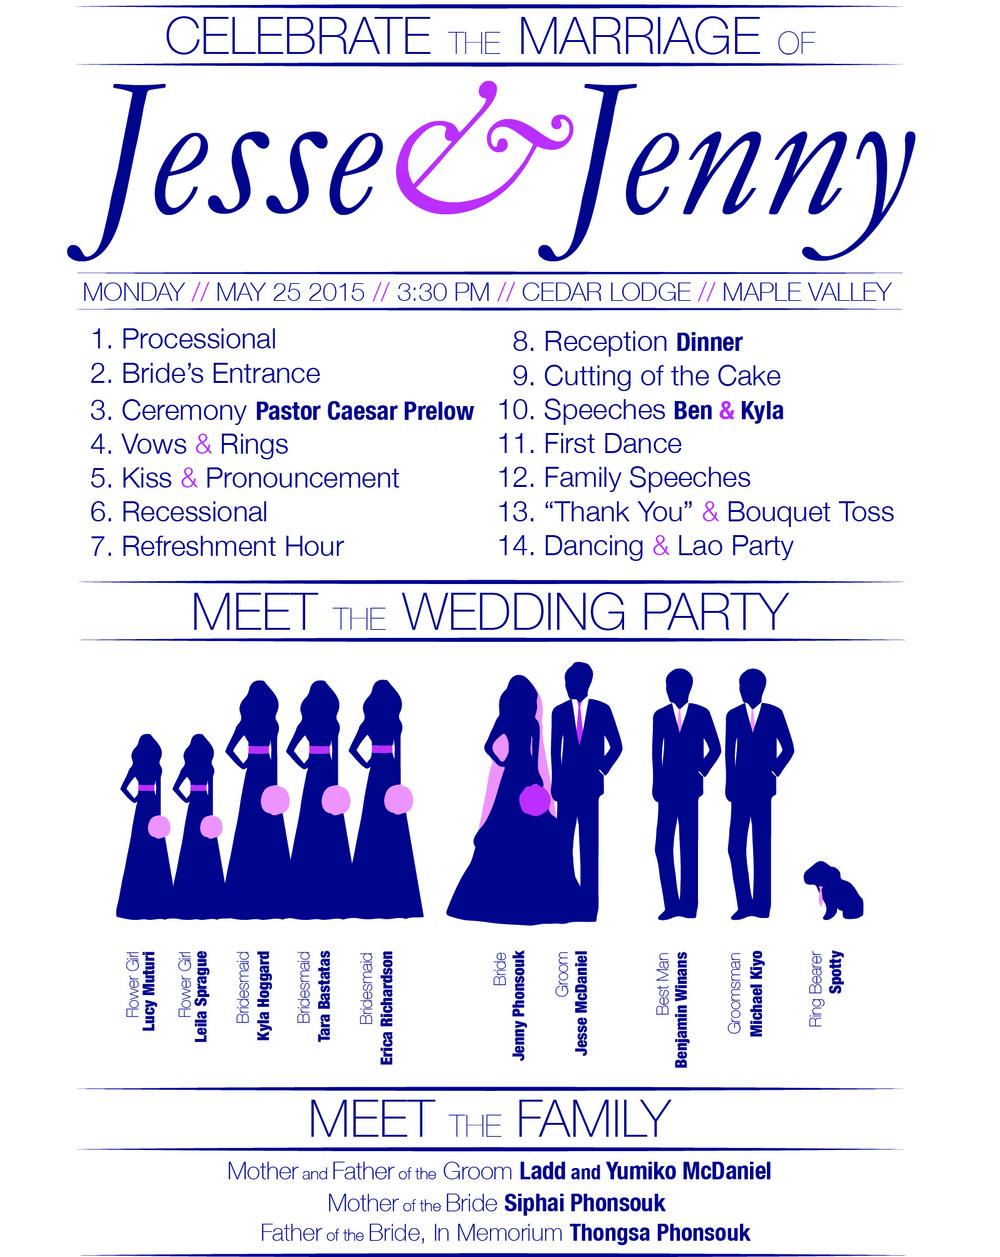 Jesse and Jenny Wedding Program